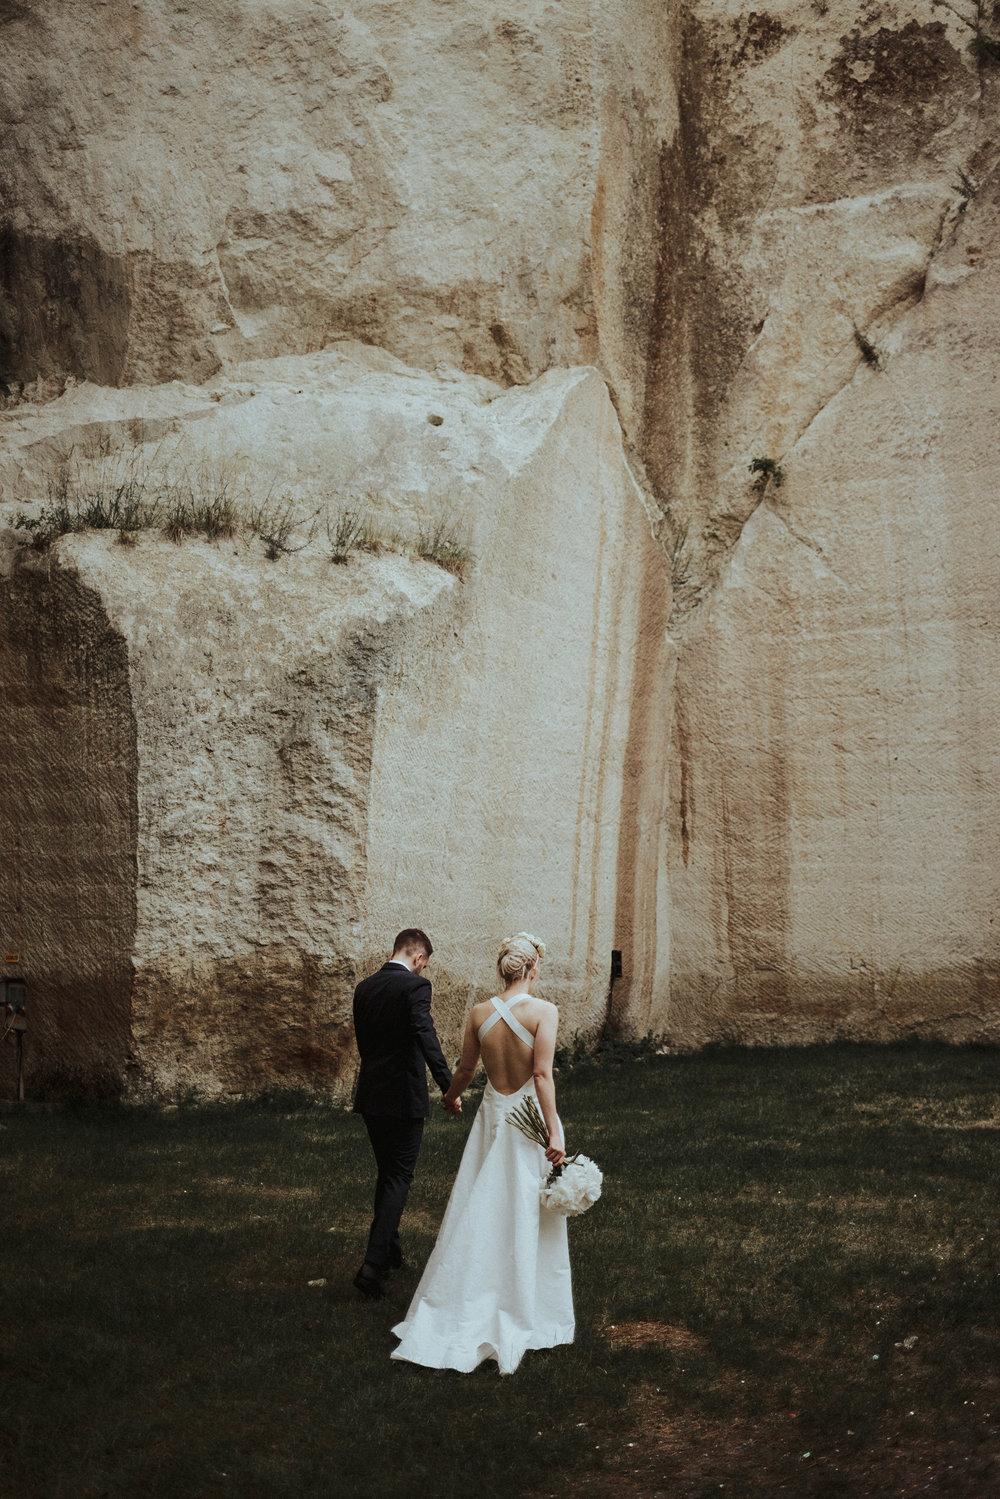 20170616_Kamilla+Peti_wedding_w_012__MG_9318_1.jpg